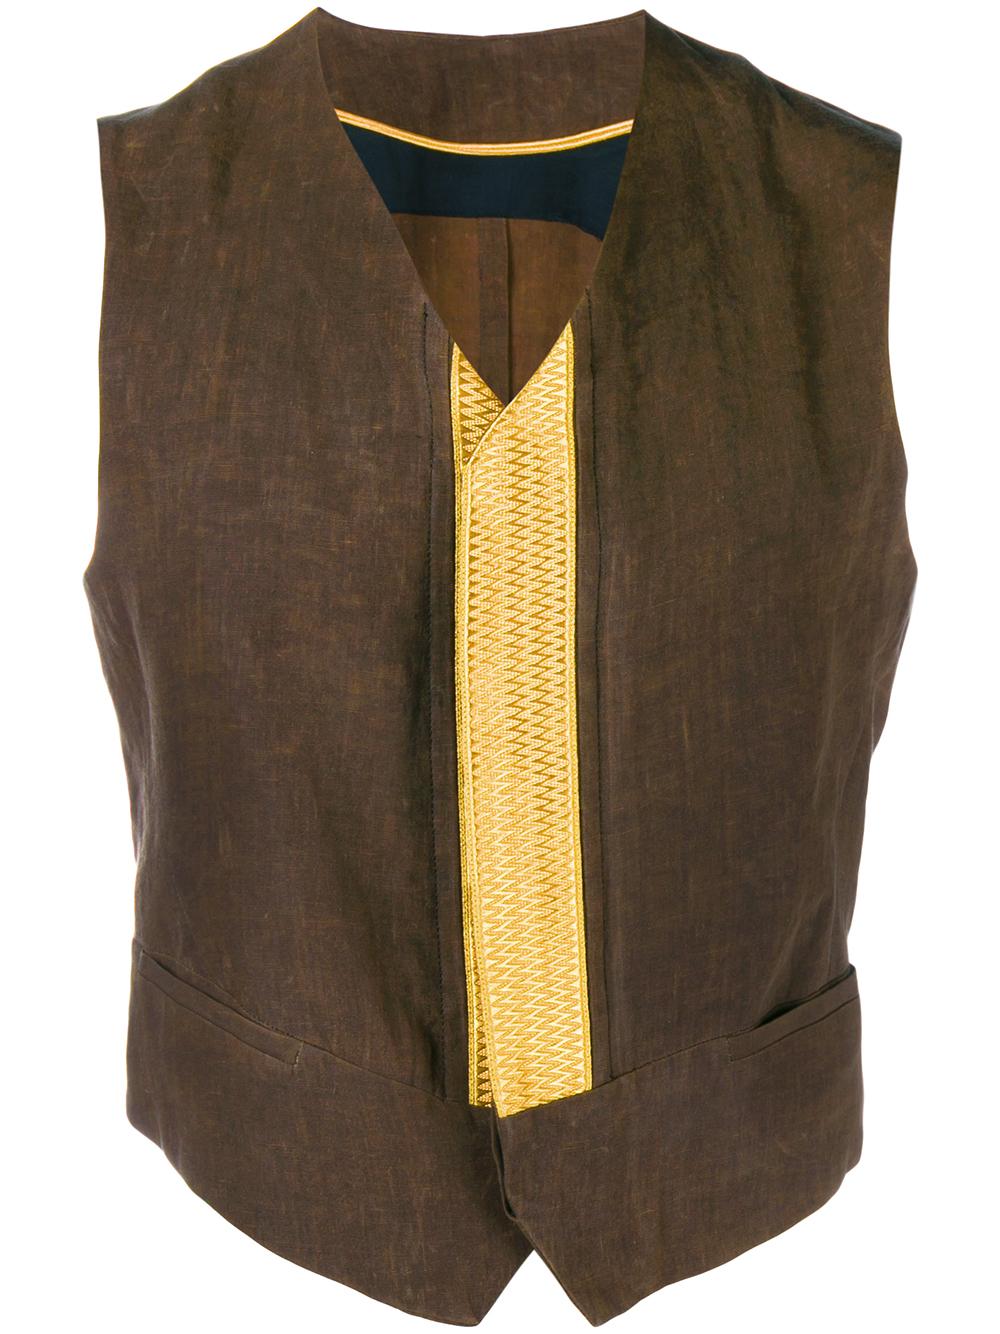 Haider Ackermann Linen Waistcoat In Brown For Men Lyst